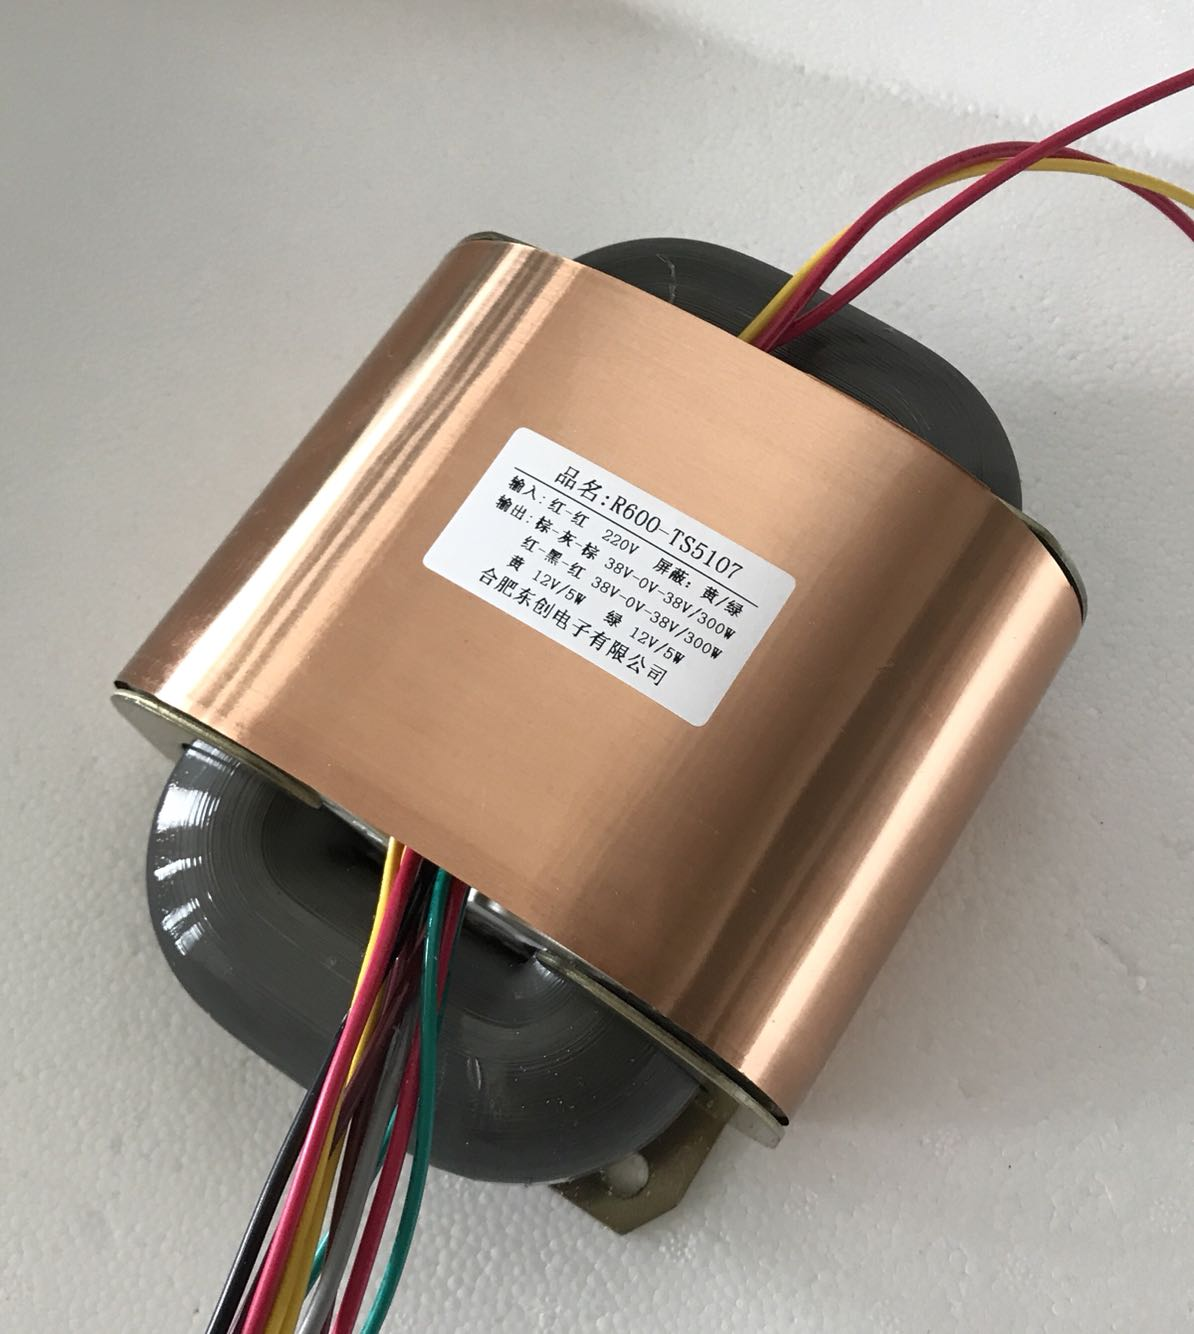 2X38V-0V-38V 3.95A 12V-0-12V 0.42A  R Core Transformer 600VA R600 custom transformer 220V copper shield Power amplifier